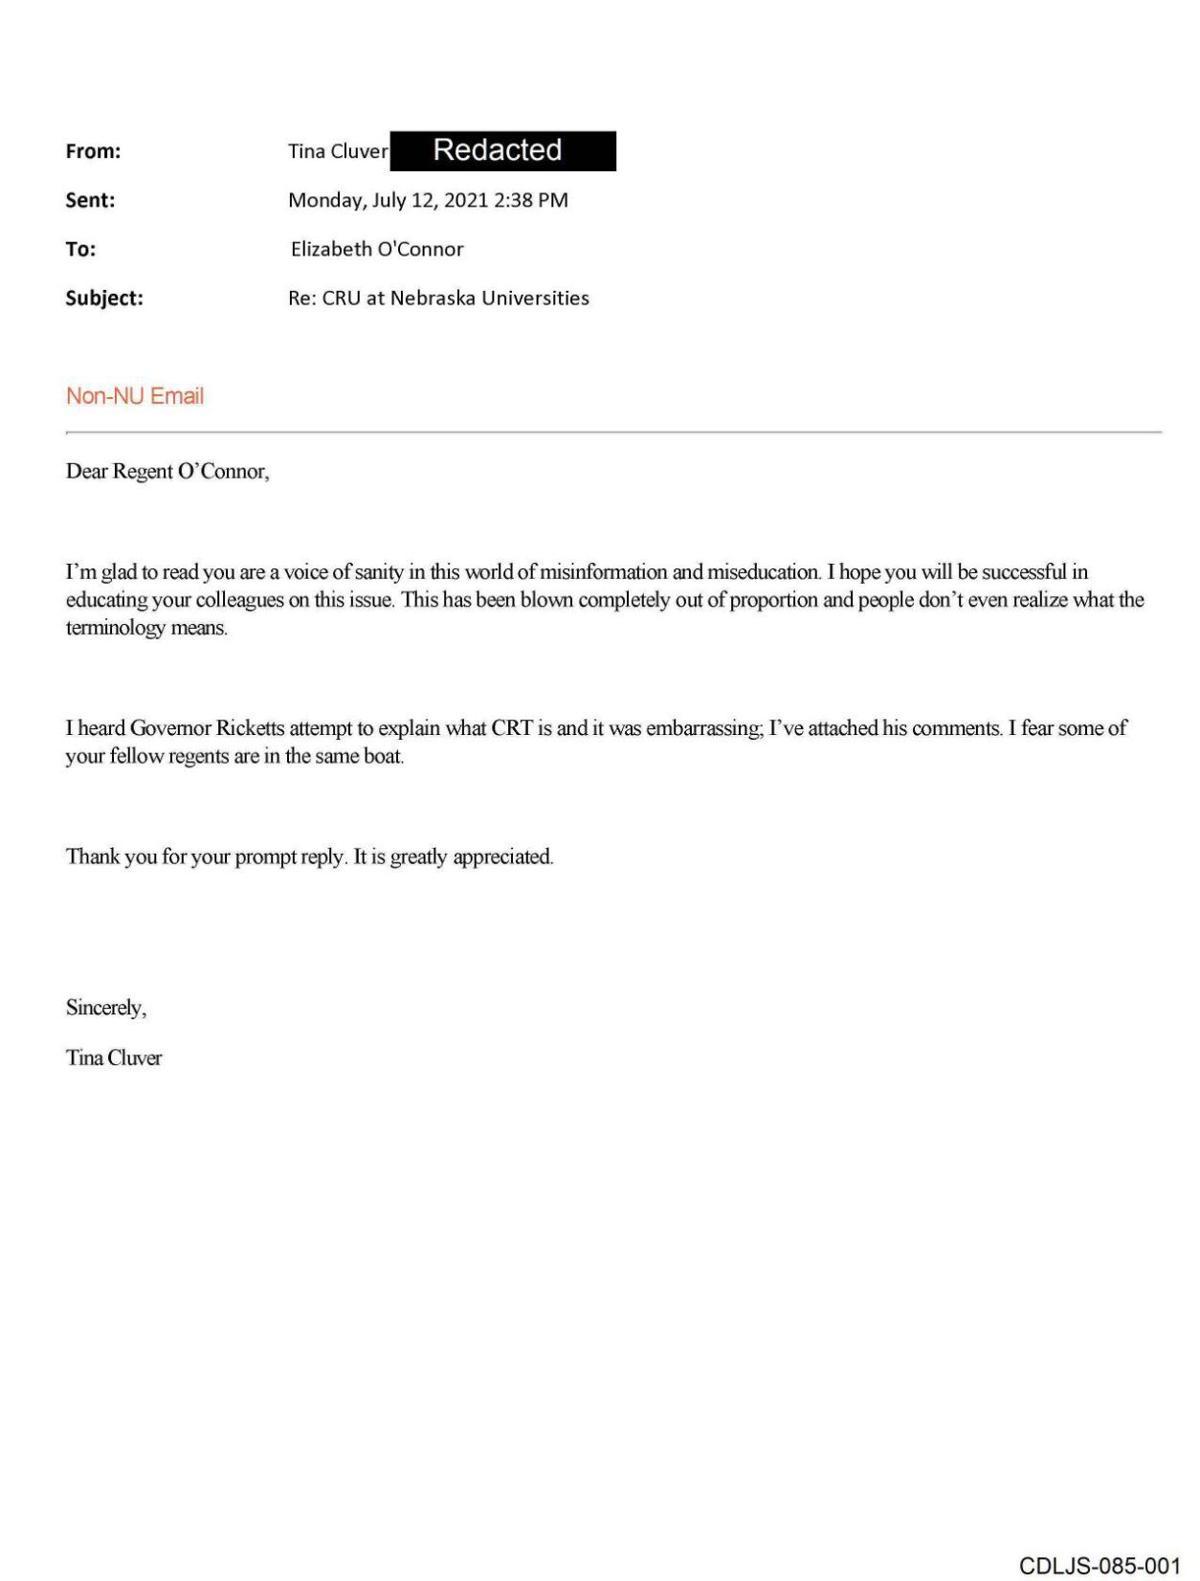 CDLJS-085-001.pdf